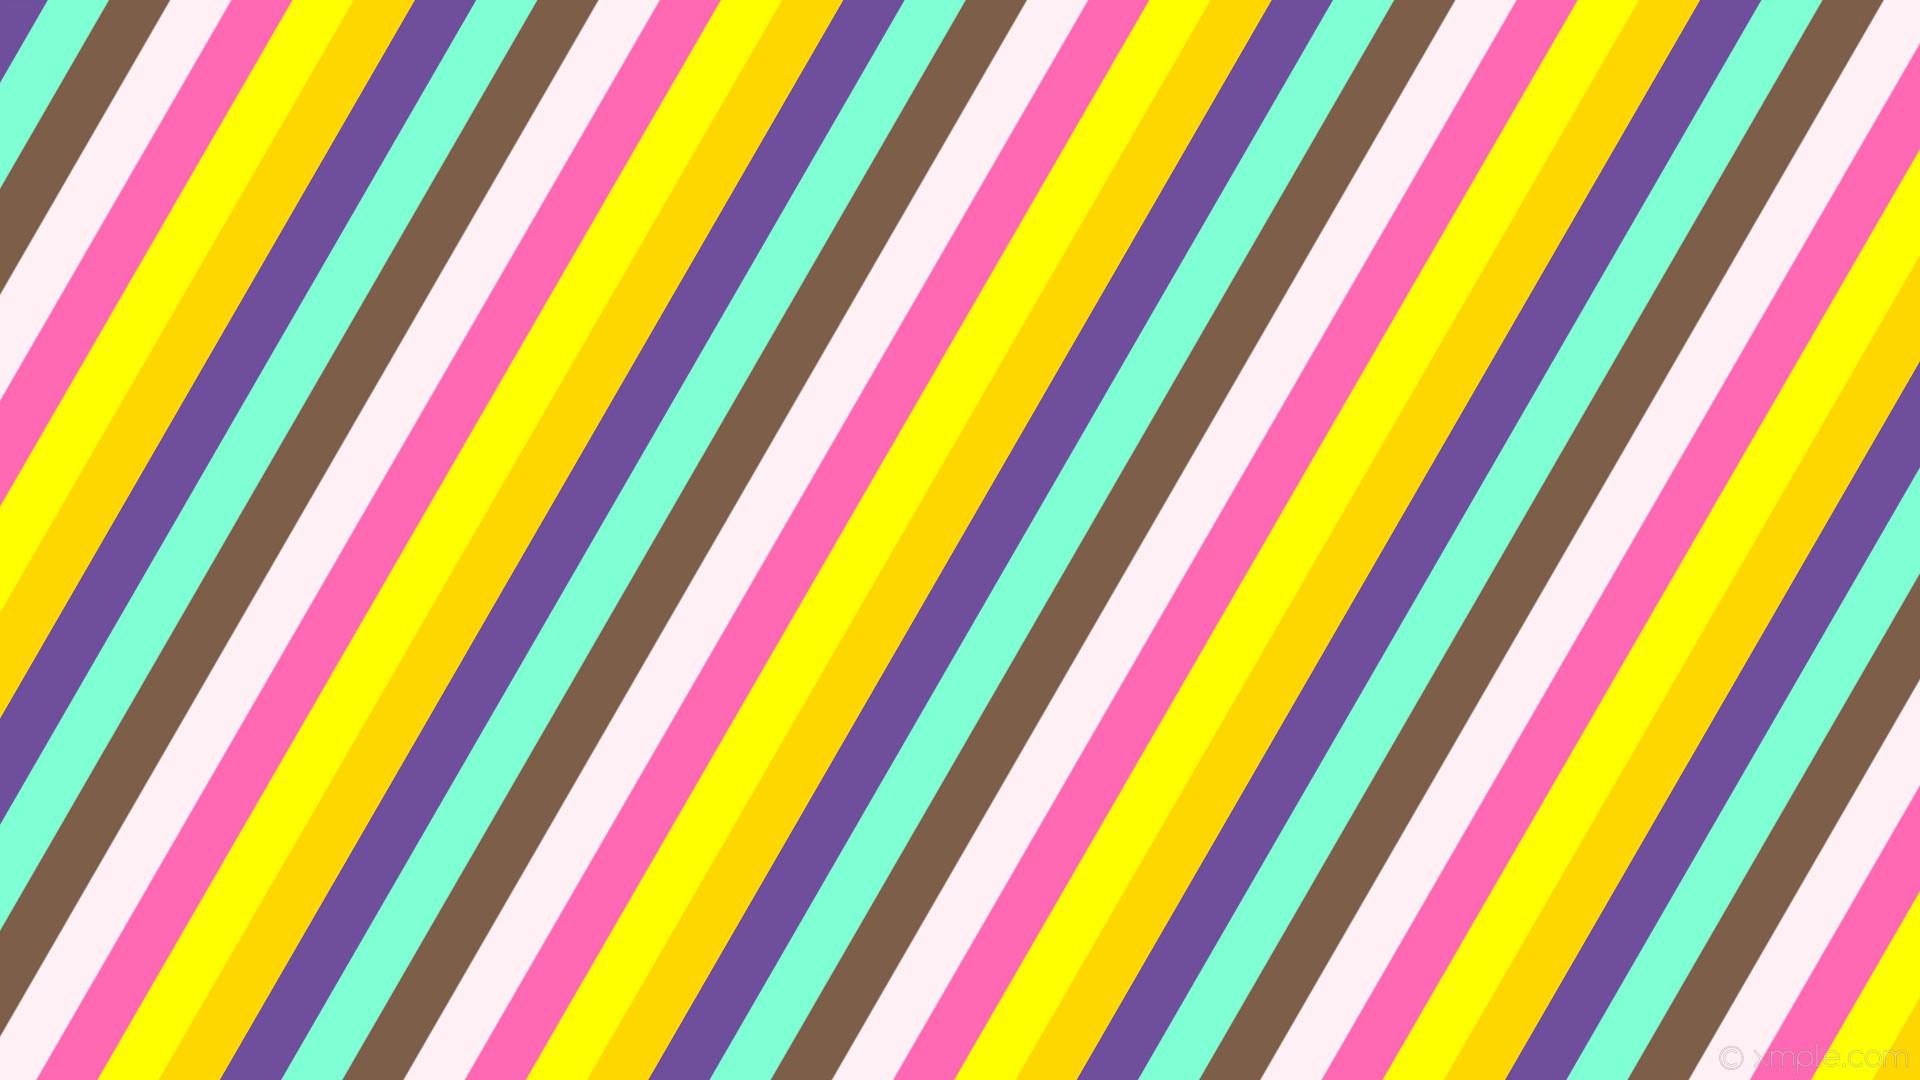 wallpaper blue orange pink white stripes streaks yellow lines violet gold  hot pink lavender blush aquamarine